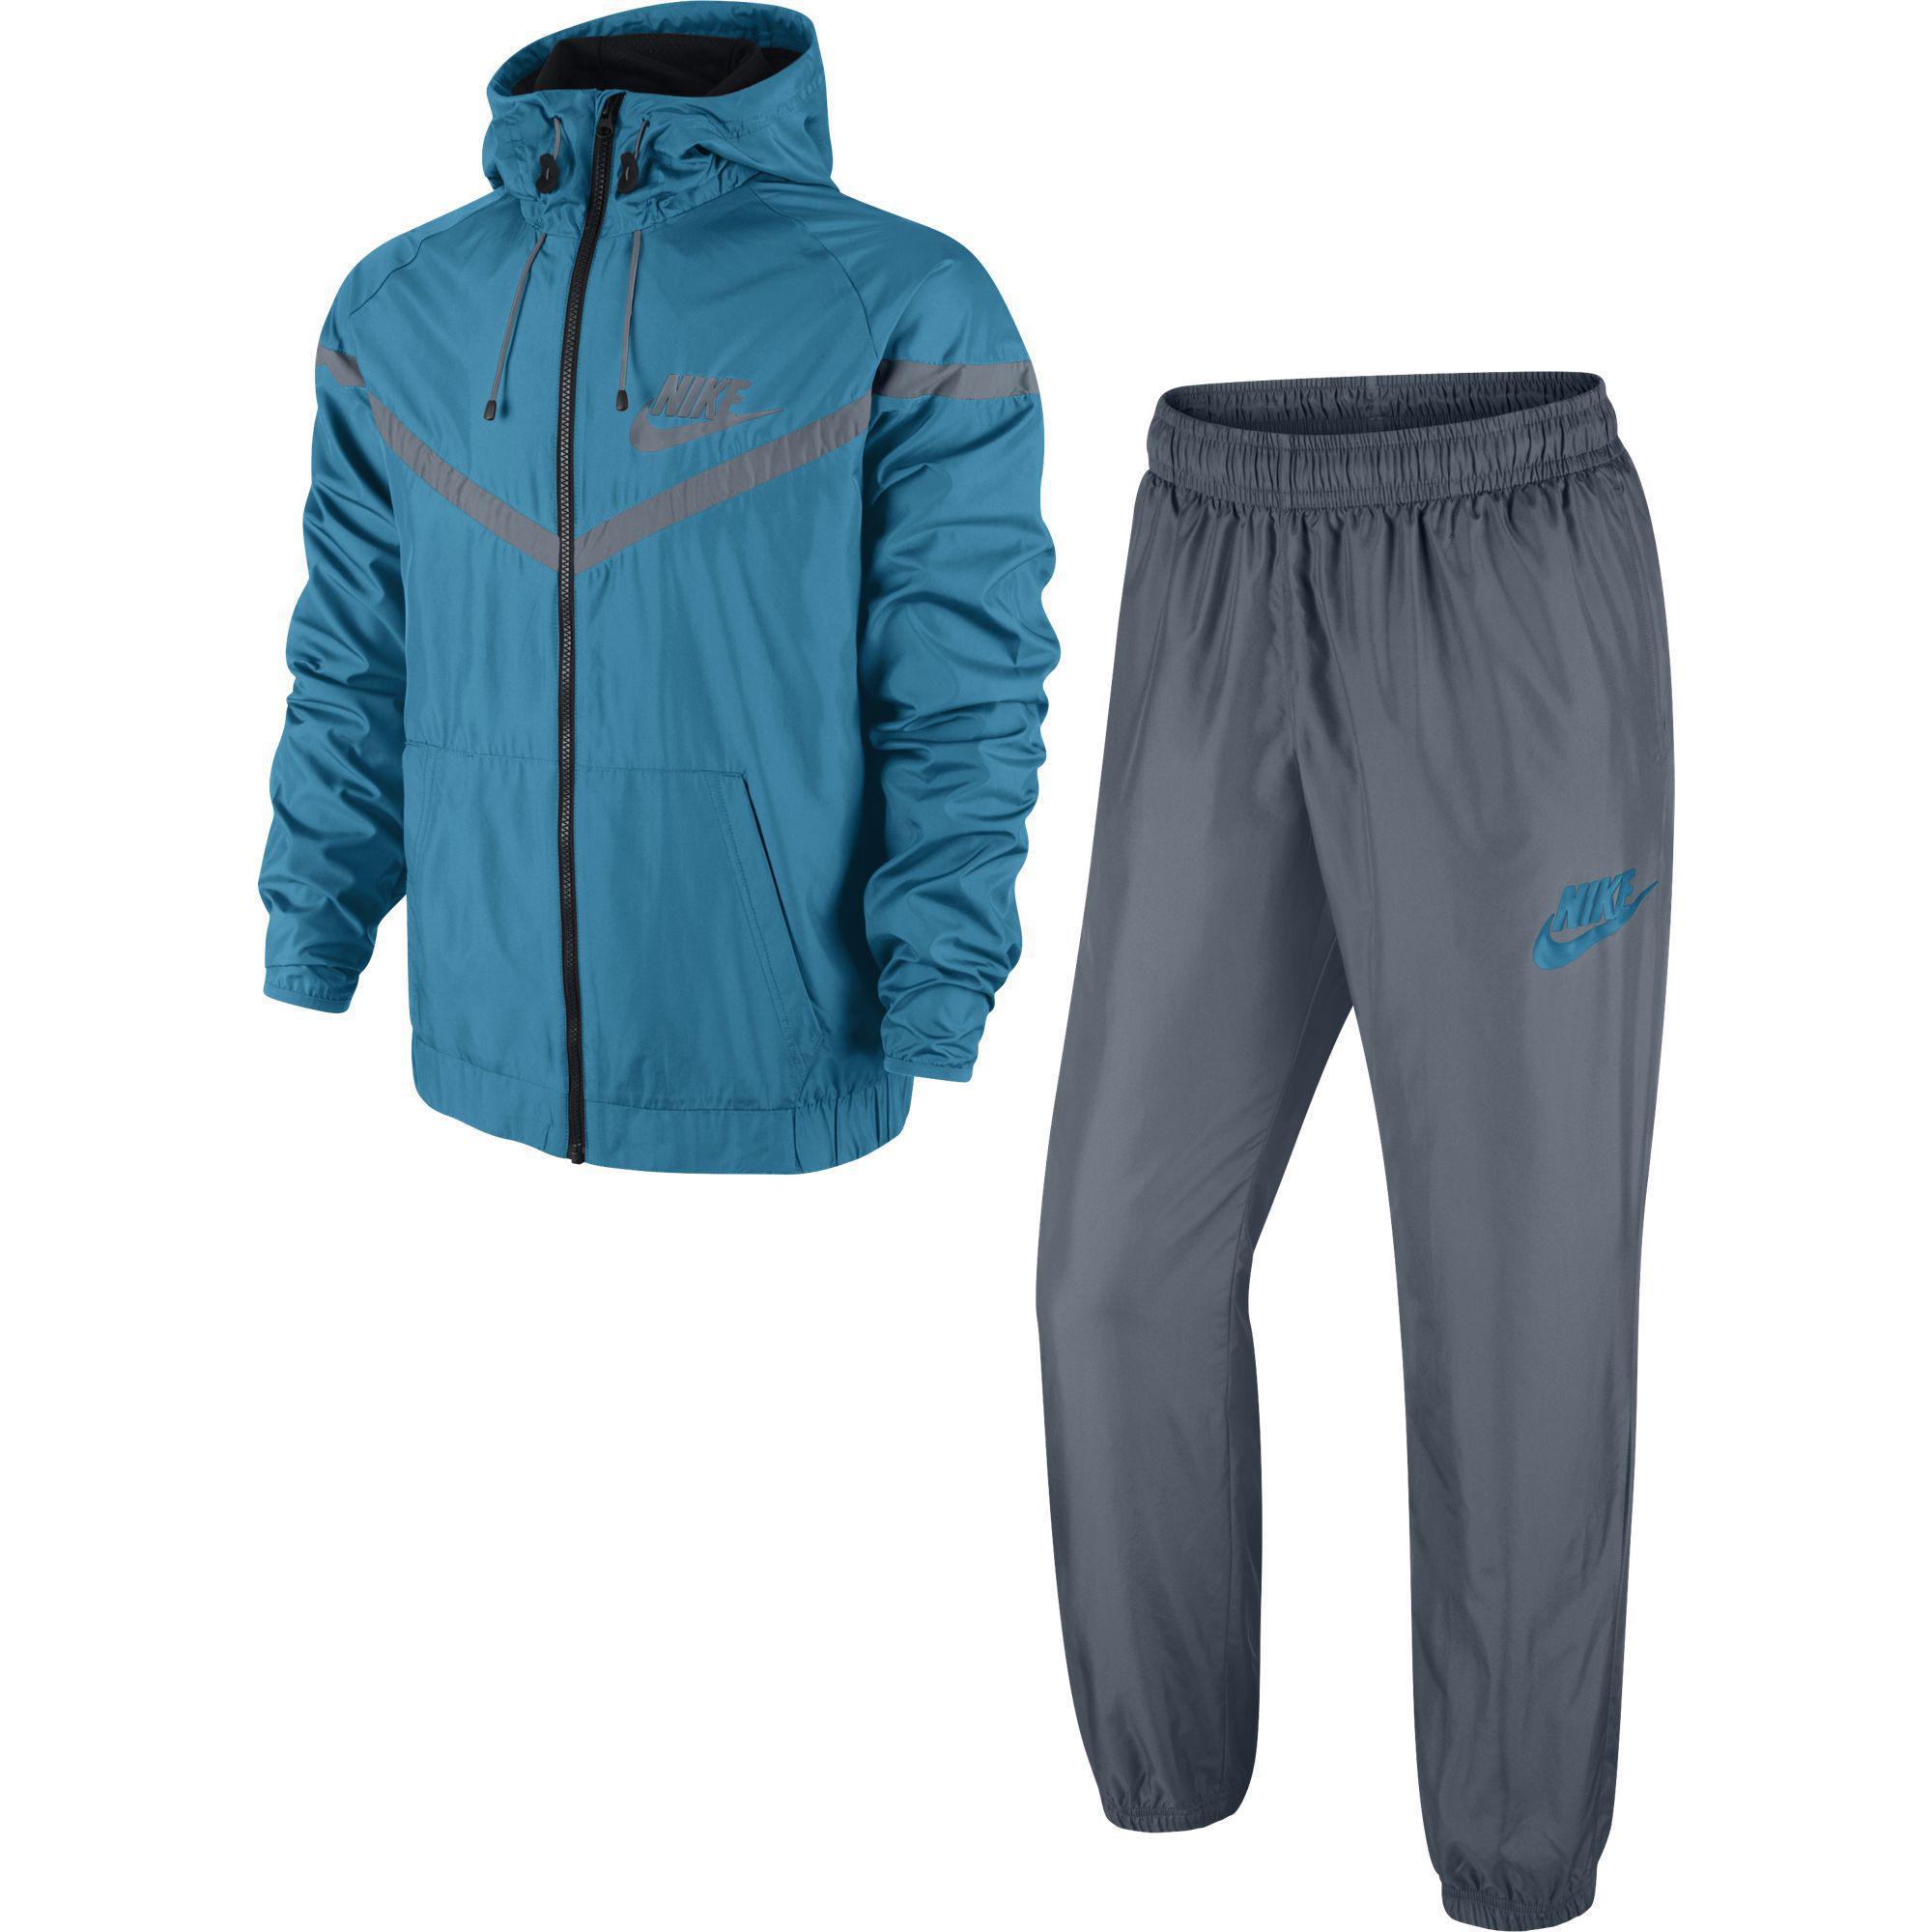 4a373024a6 Nike Mens Fearless Woven Tracksuit - Light Blue Lacquer - Tennisnuts.com